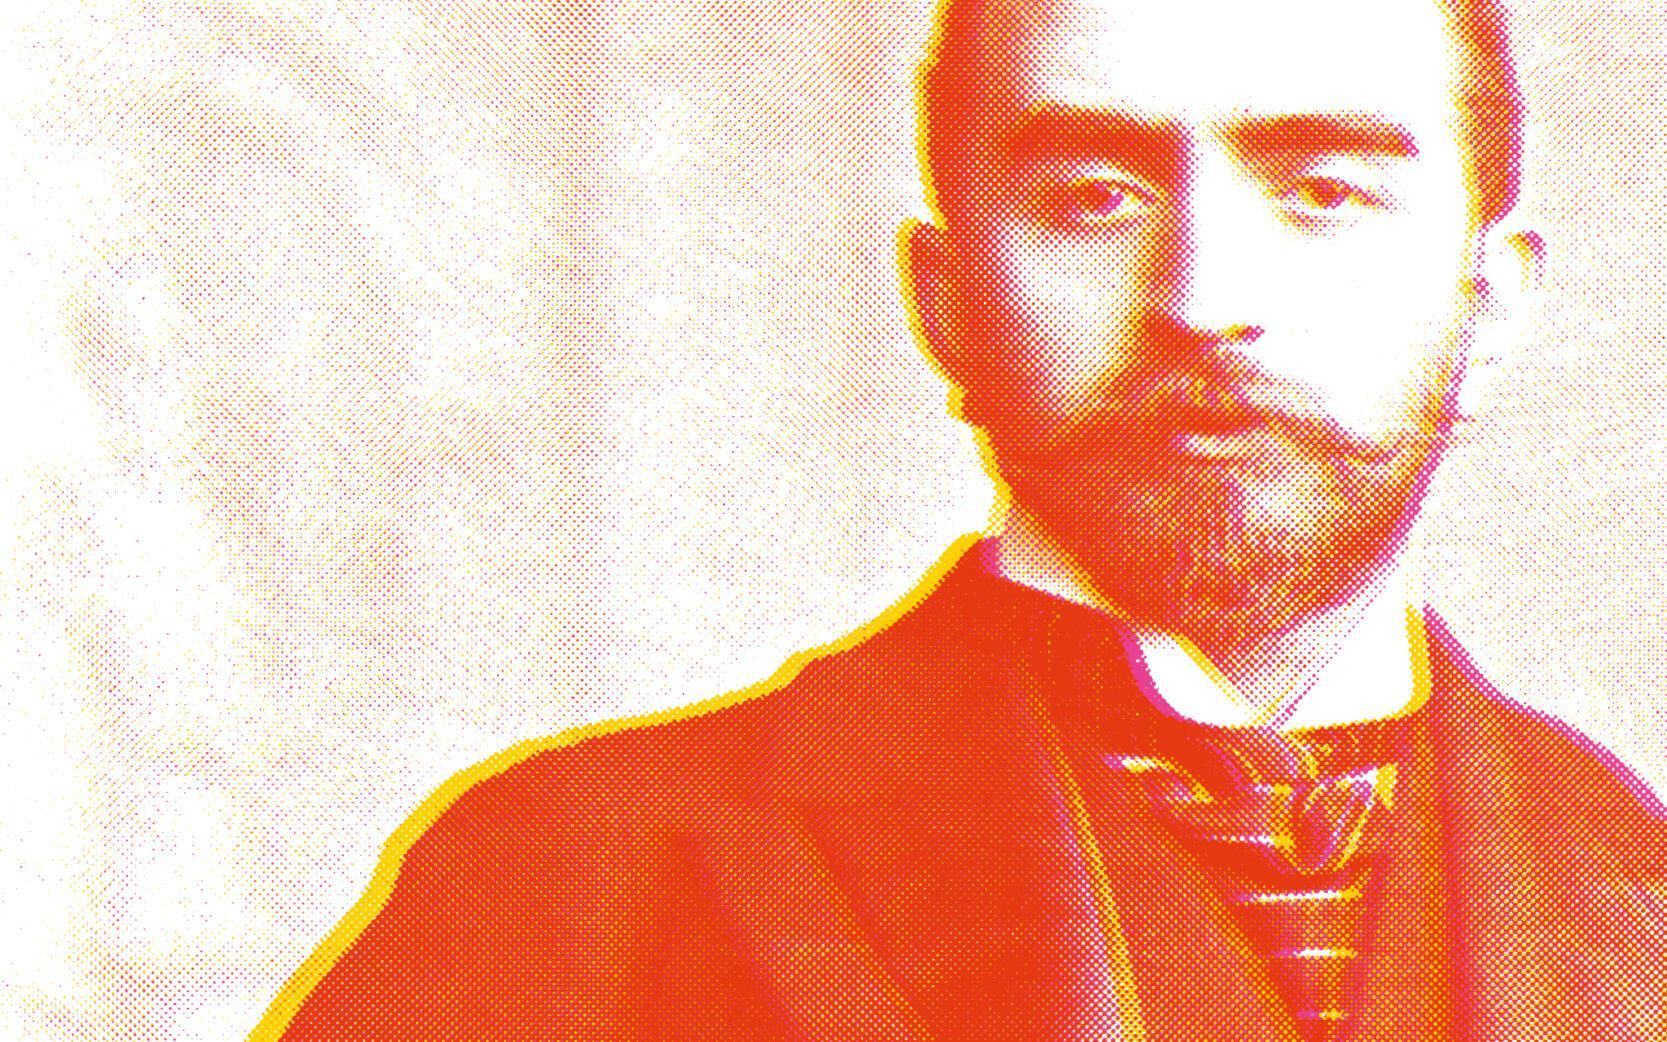 Afinal, quem foi Calouste Gulbenkian?